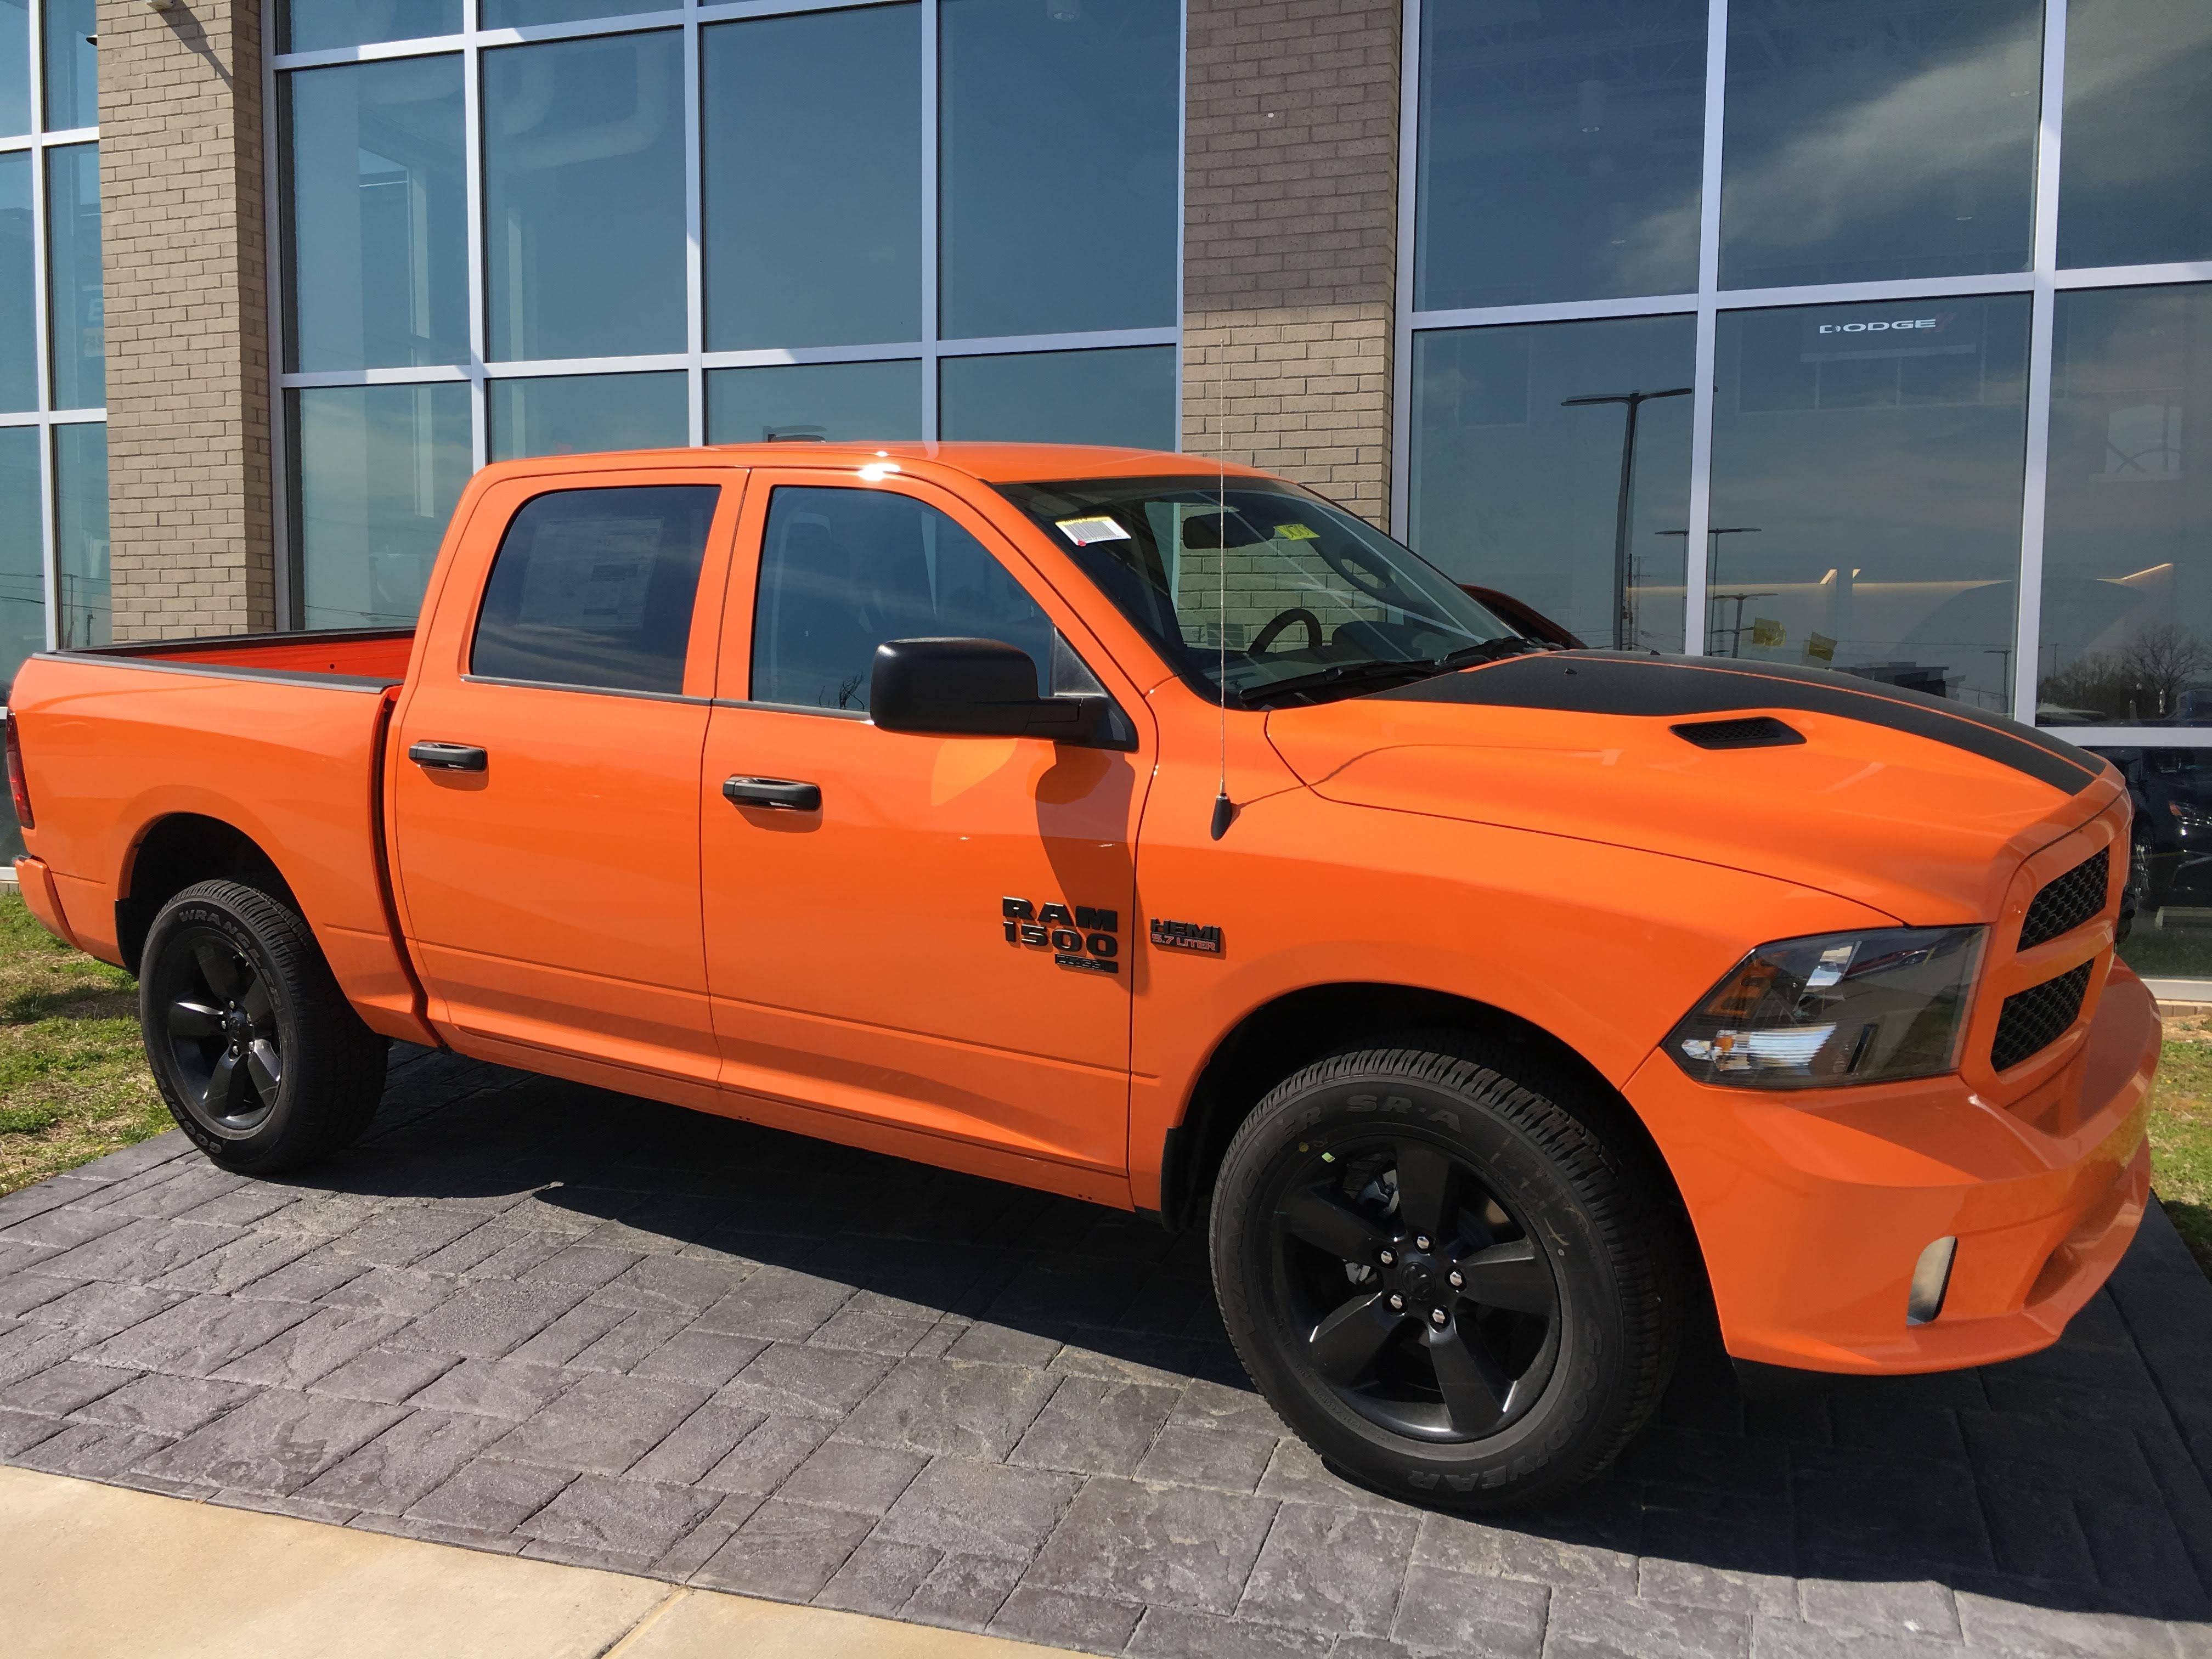 2019 ram 1500 in ignition orange chrysler jeep nashville dodge chrysler pinterest